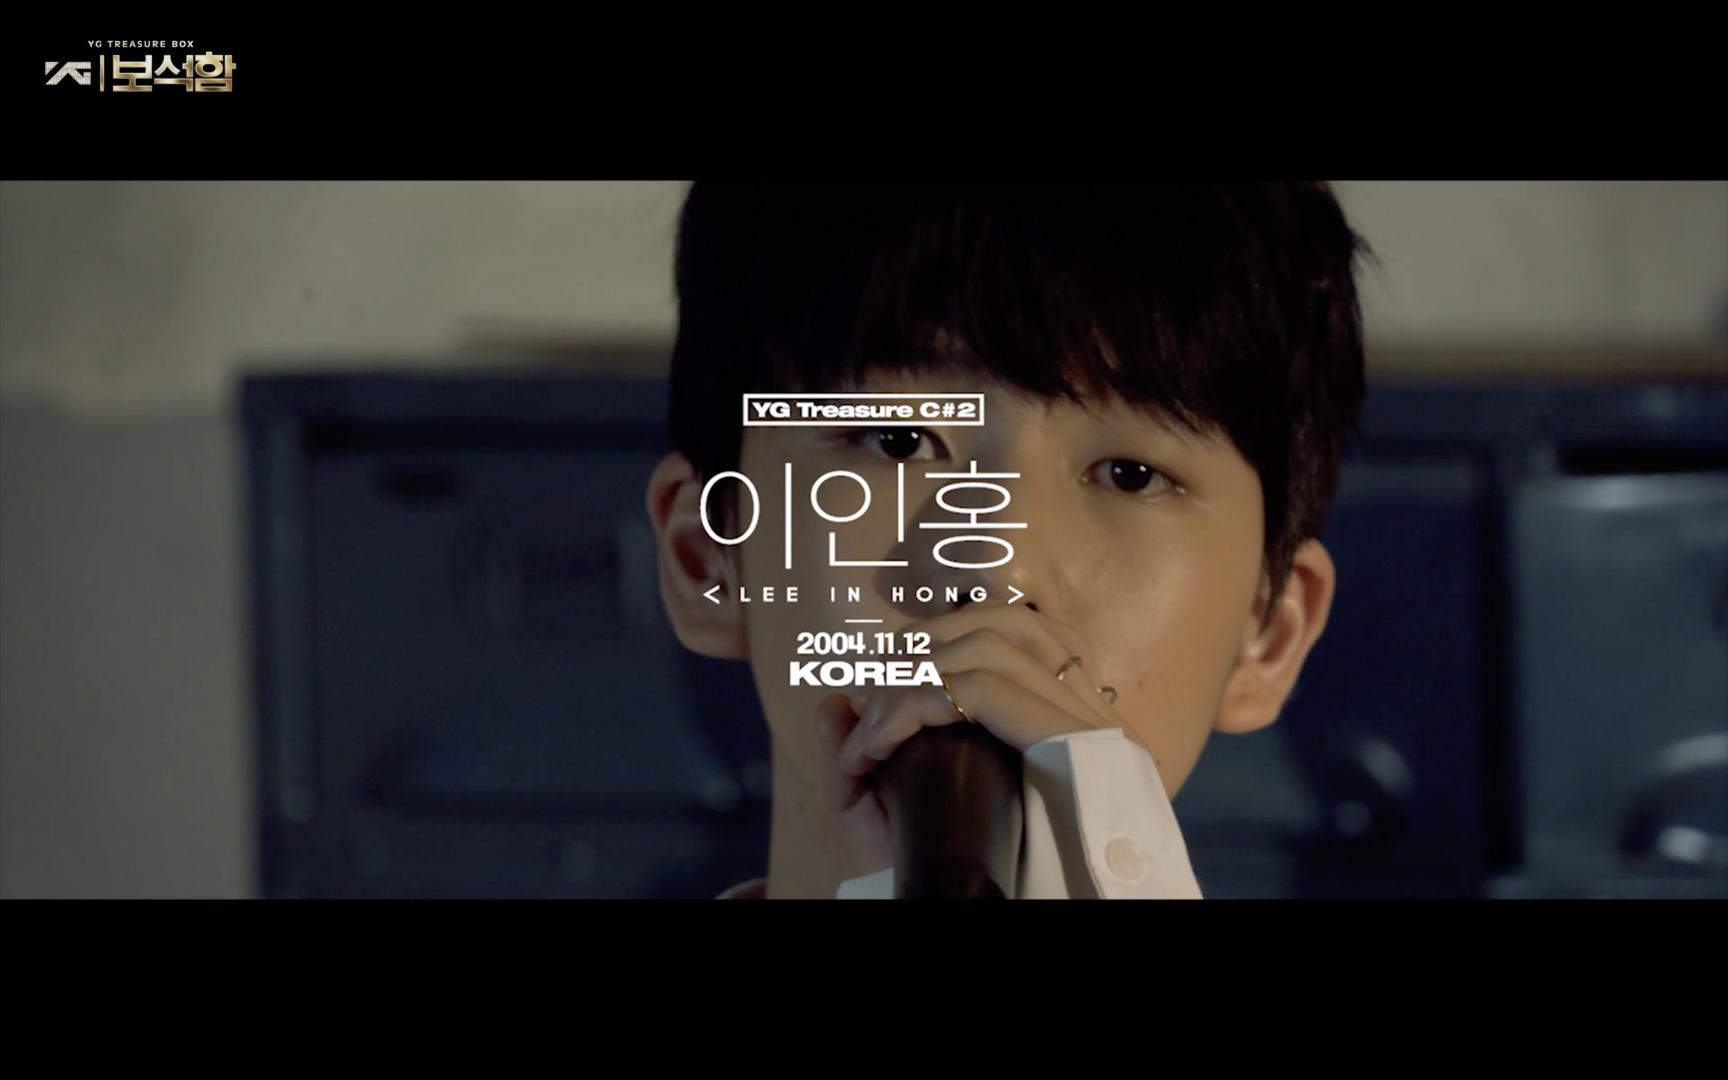 YG보석함ㅣC#2 이인홍 <LEE INHONG>#인터뷰+퍼포먼스